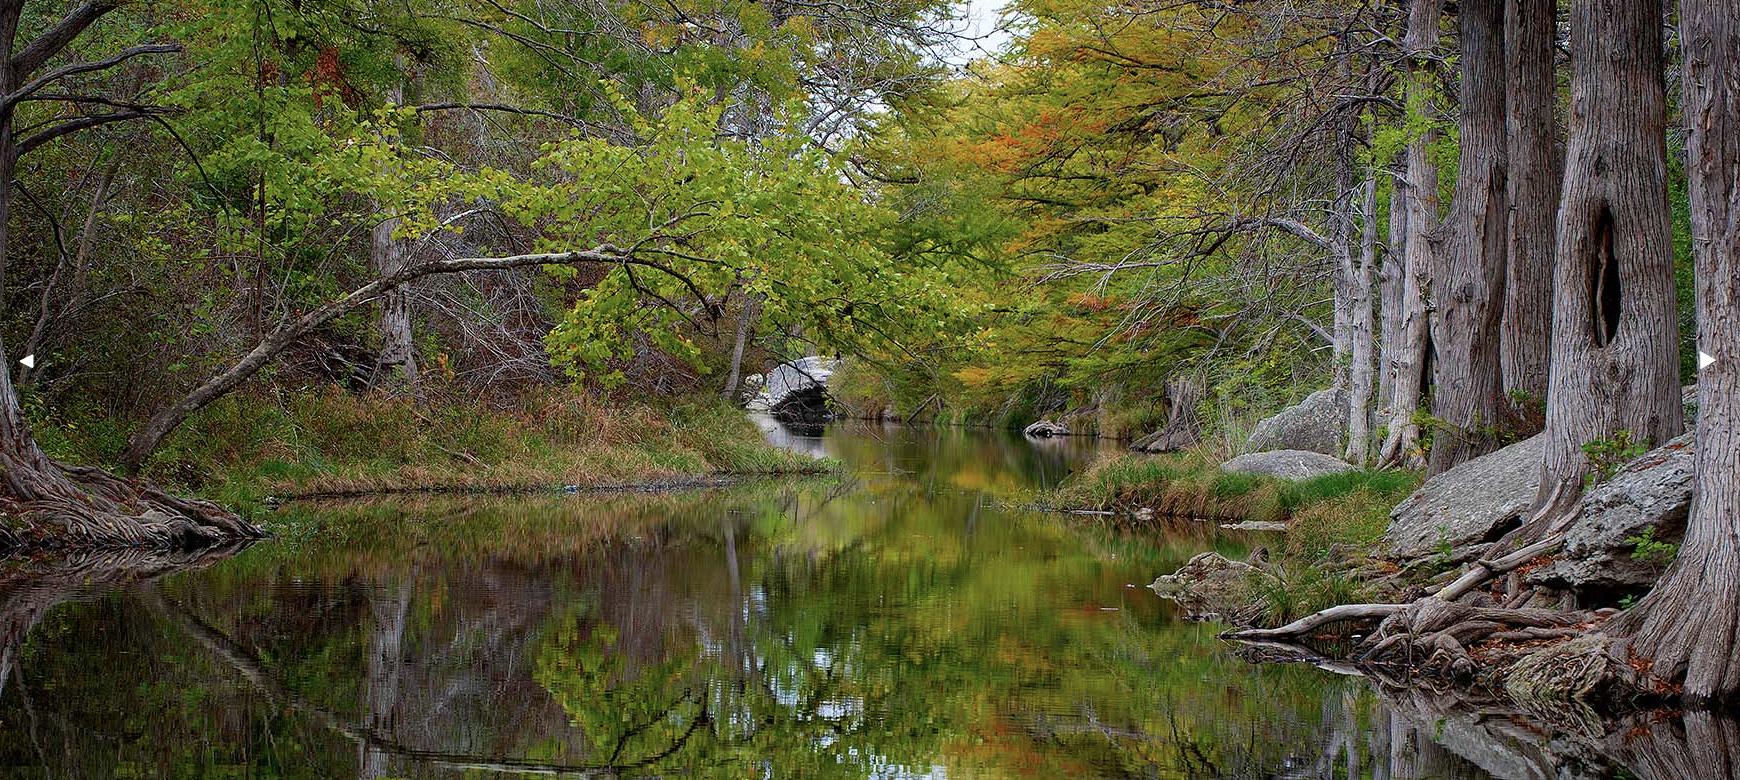 "<h3>McKinney Falls State Park</h3>""> </div> <div class="